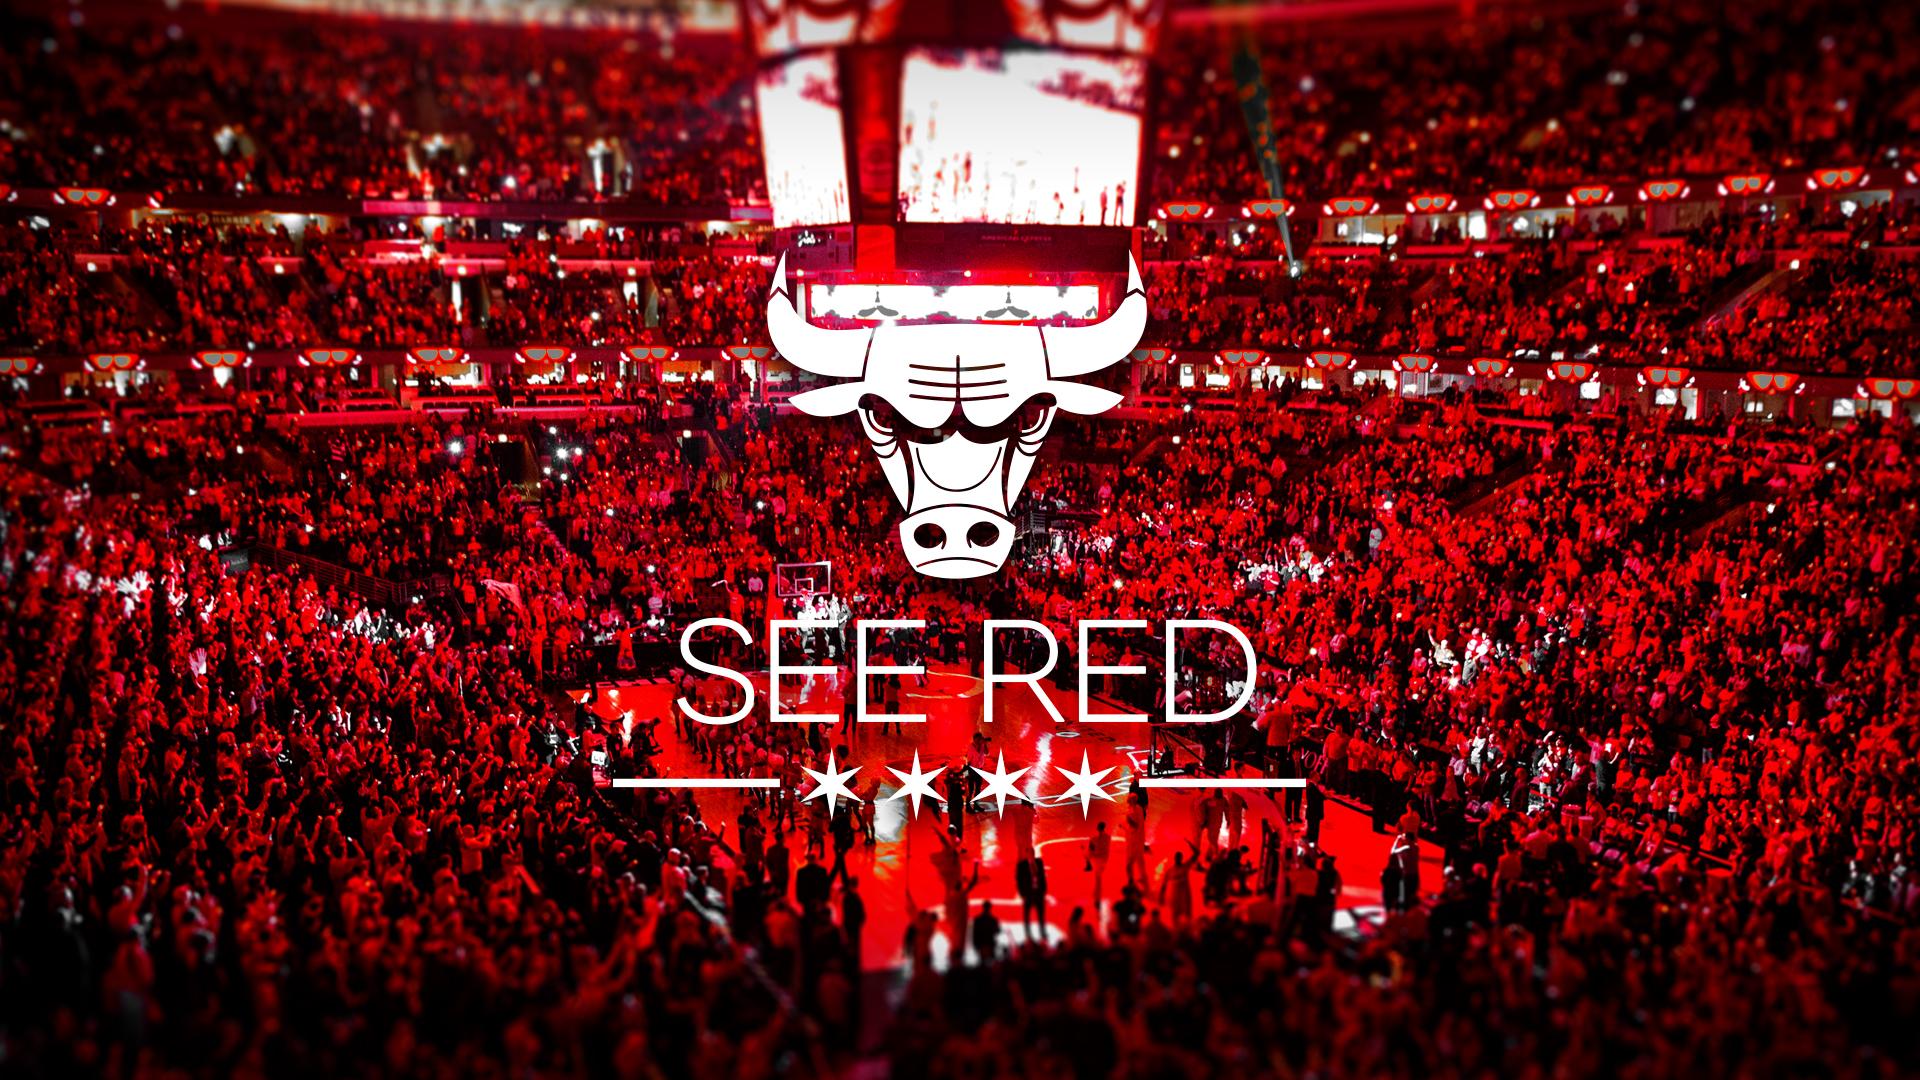 Chicago Bulls Wallpaper See Red wallpaper   1311132 1920x1080